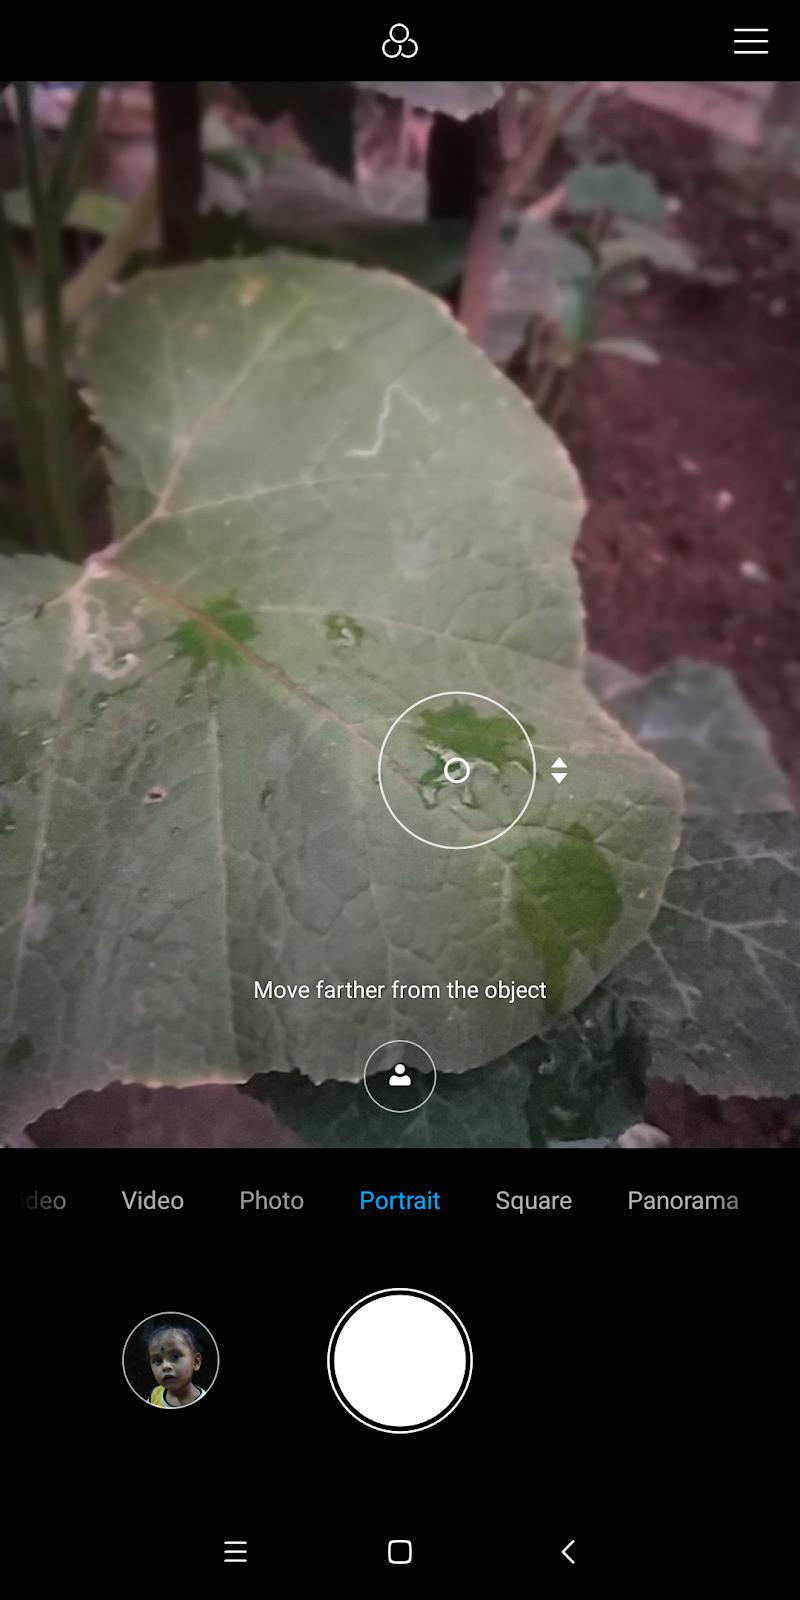 Redmi Note 5 Pro Oreo 8 1 Build Camera Apk